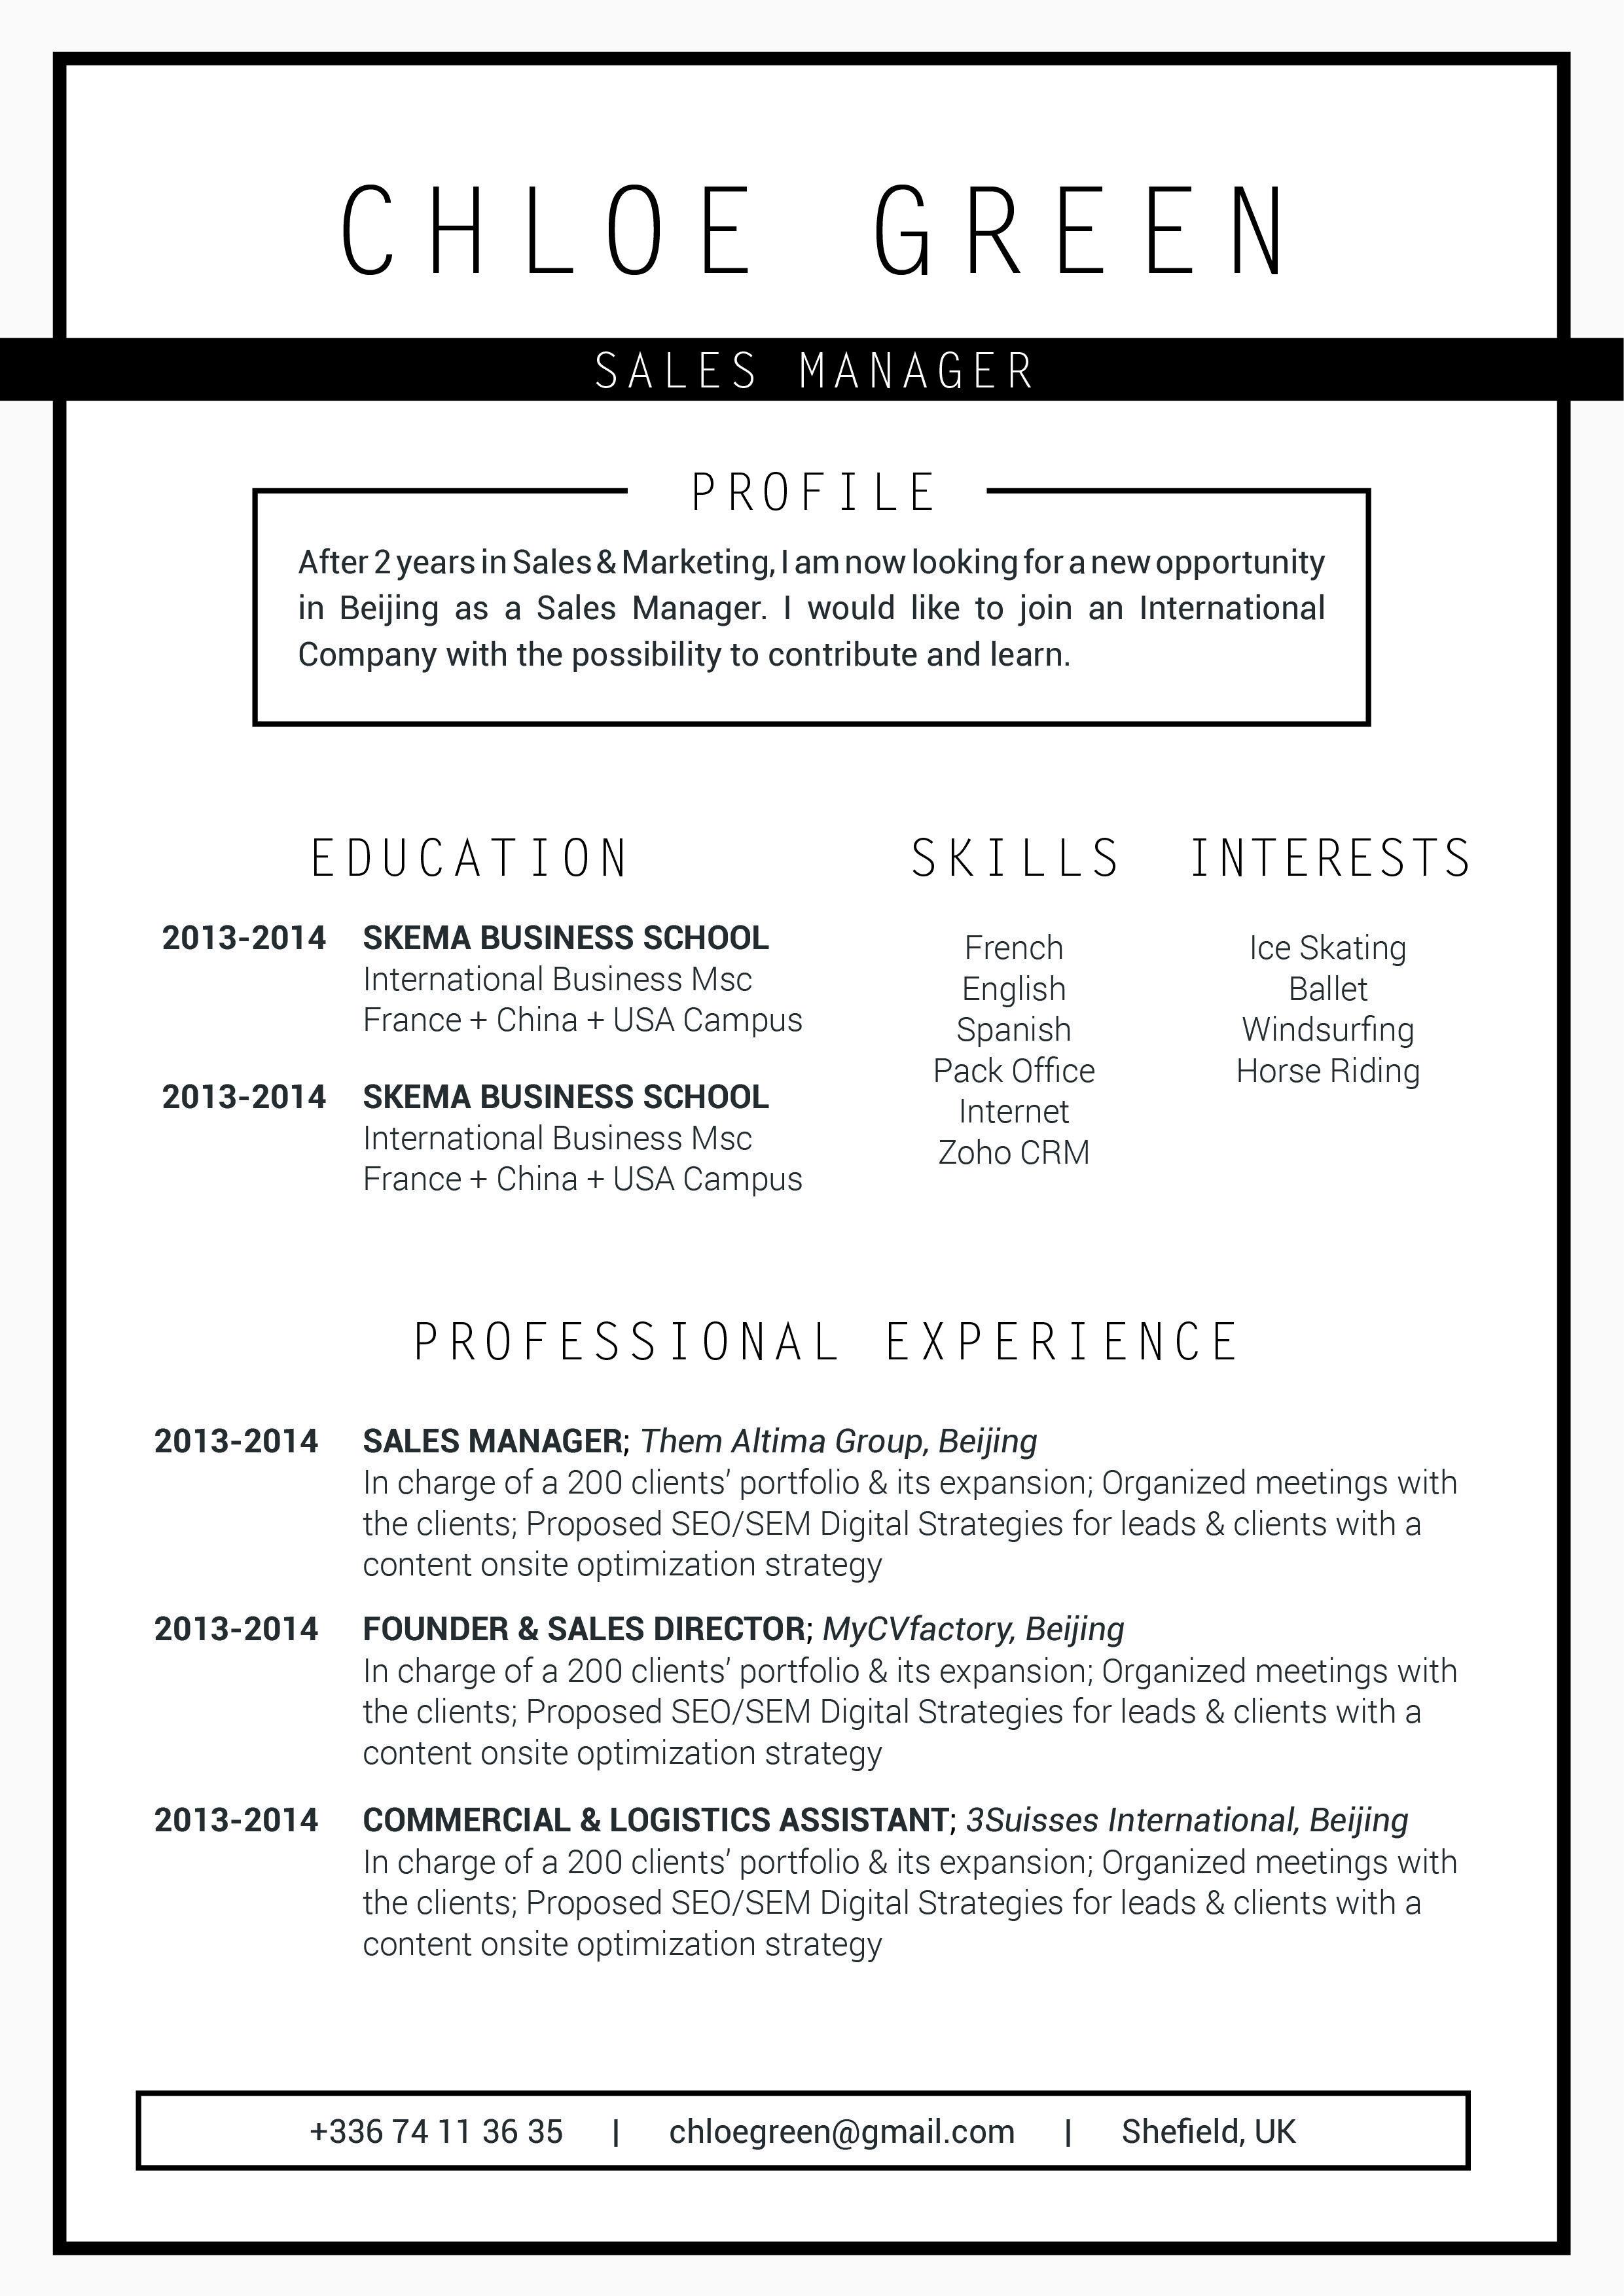 resume-template-mycvfactory-natural-0.jpg